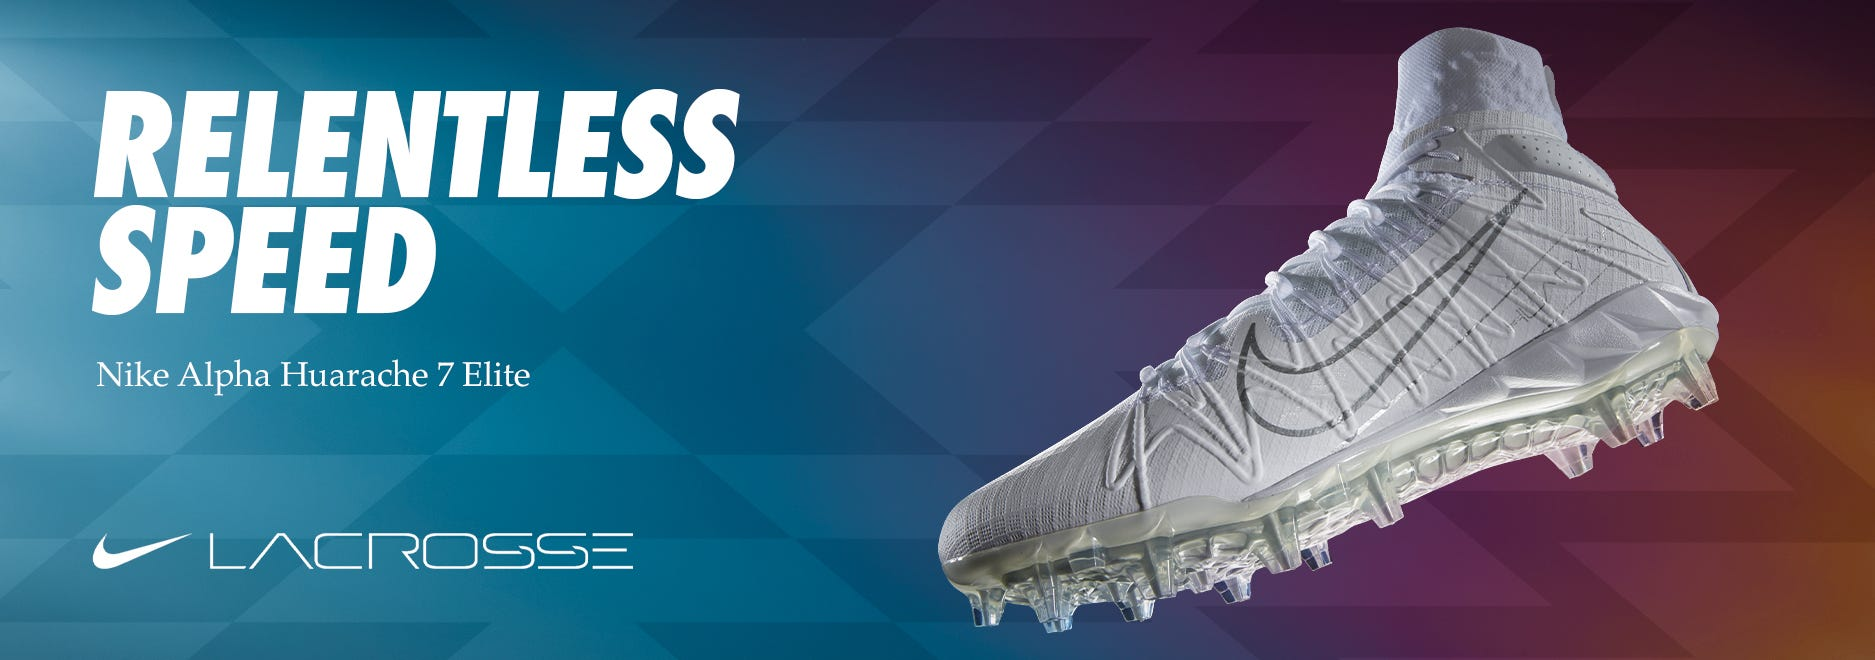 Nike Huarache 7 Lacrosse Cleats